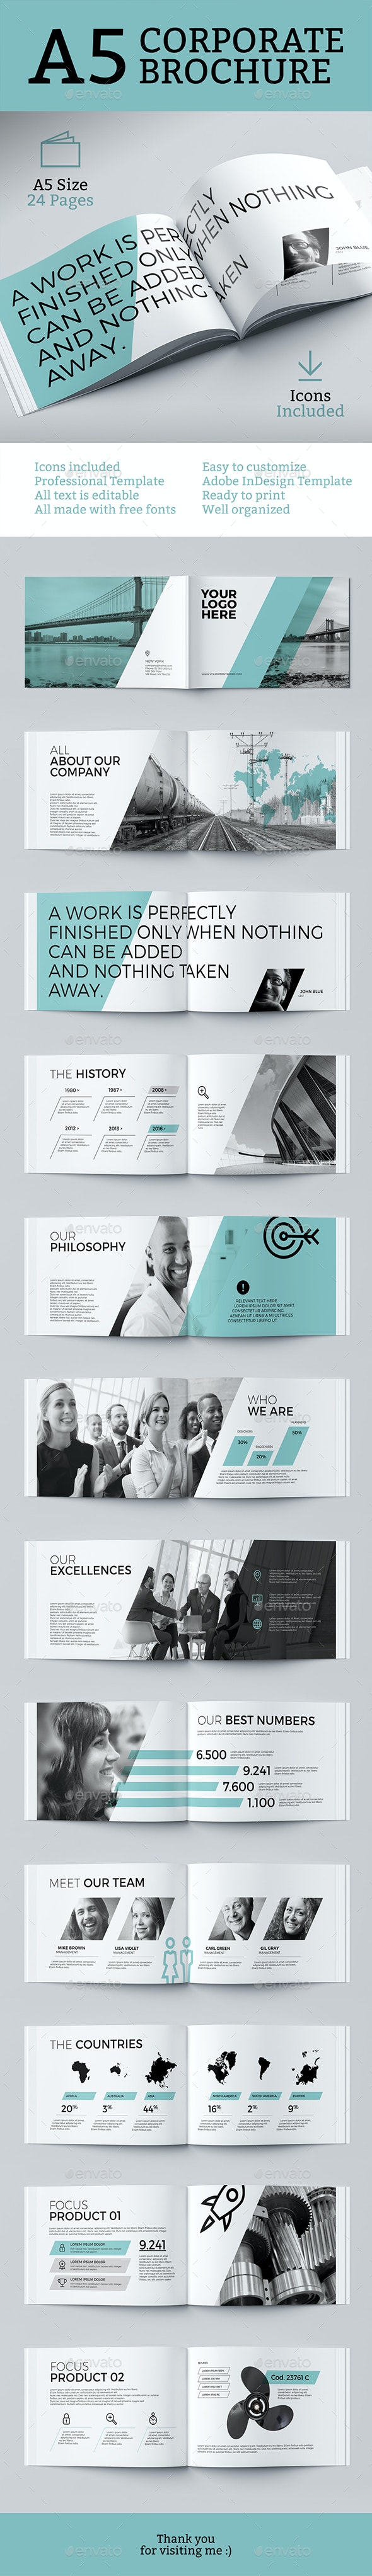 Corporate Brochure Air - A5 - Brochures Print Templates